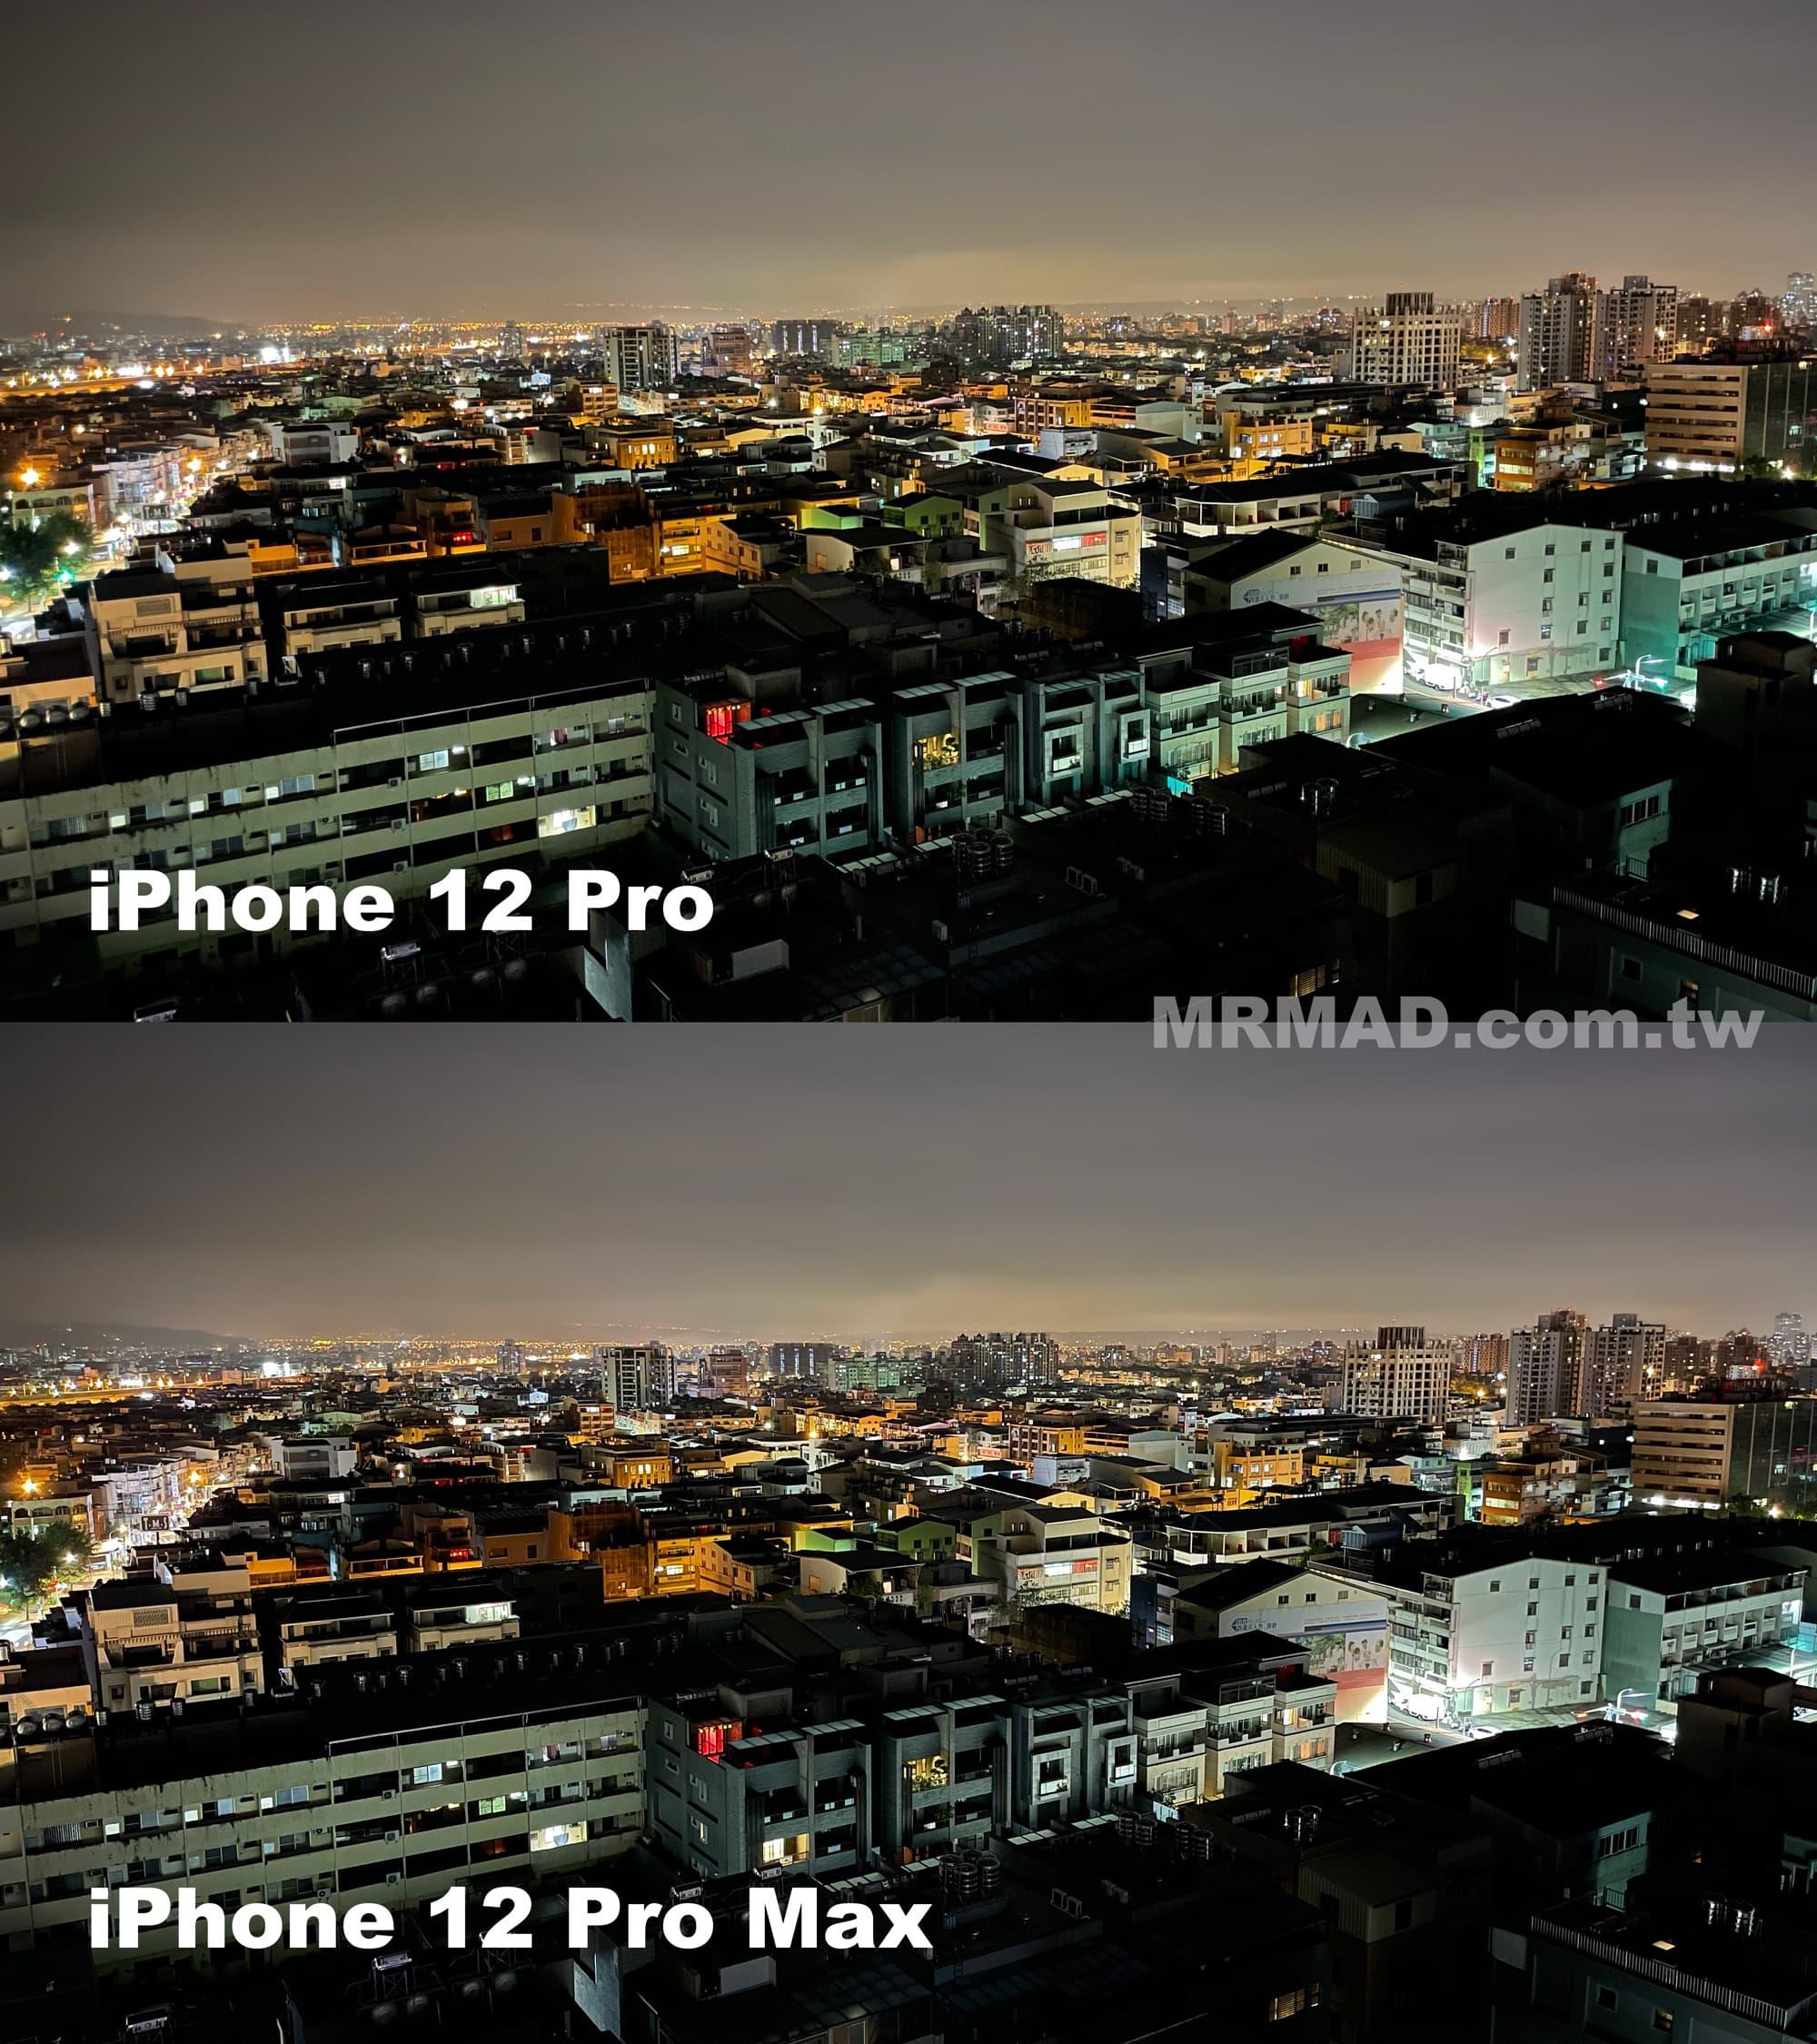 iPhone 12 Pro Max vs. iPhone 12 Pro 夜拍比較3